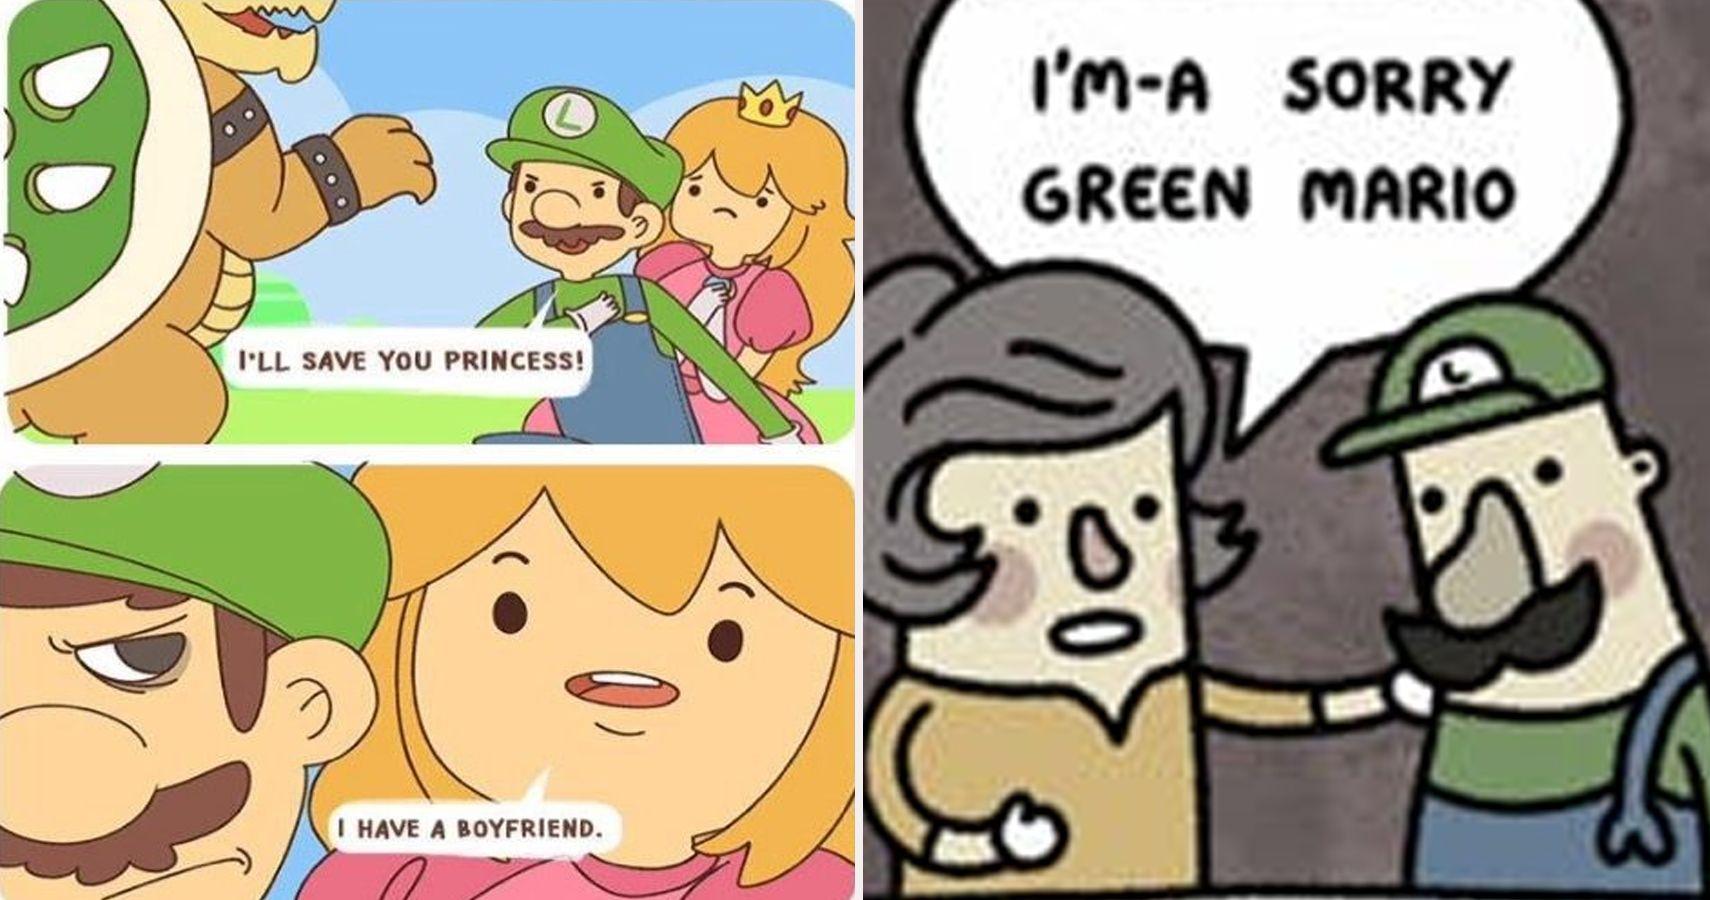 Family Feud 25 Hilarious Mario Vs Luigi Memes That Make